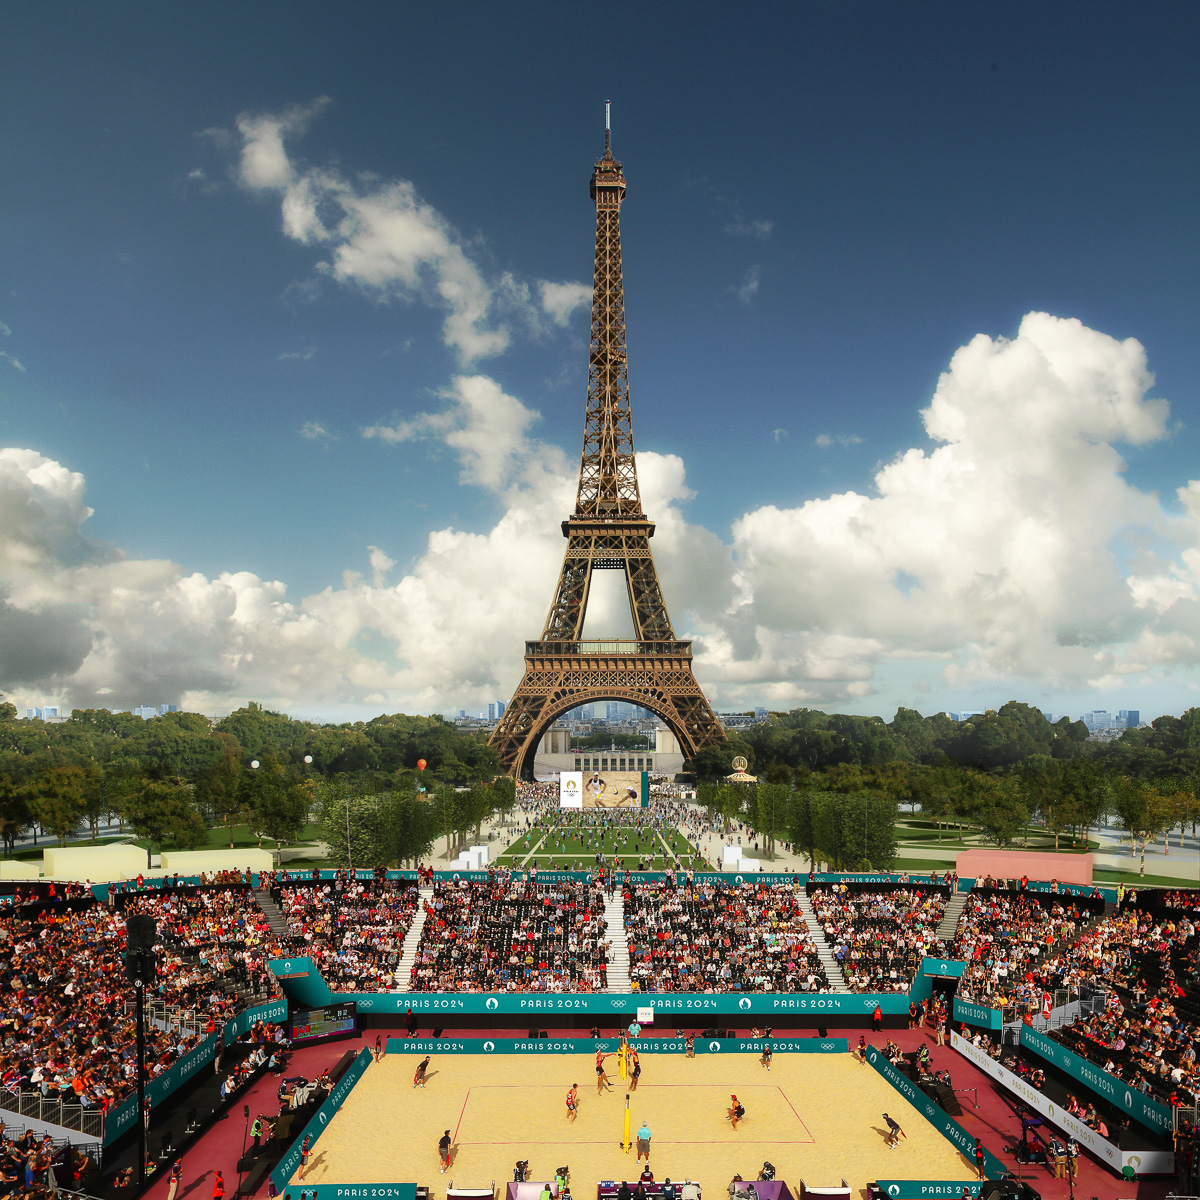 Paris2024 Stade Tour Eiffel